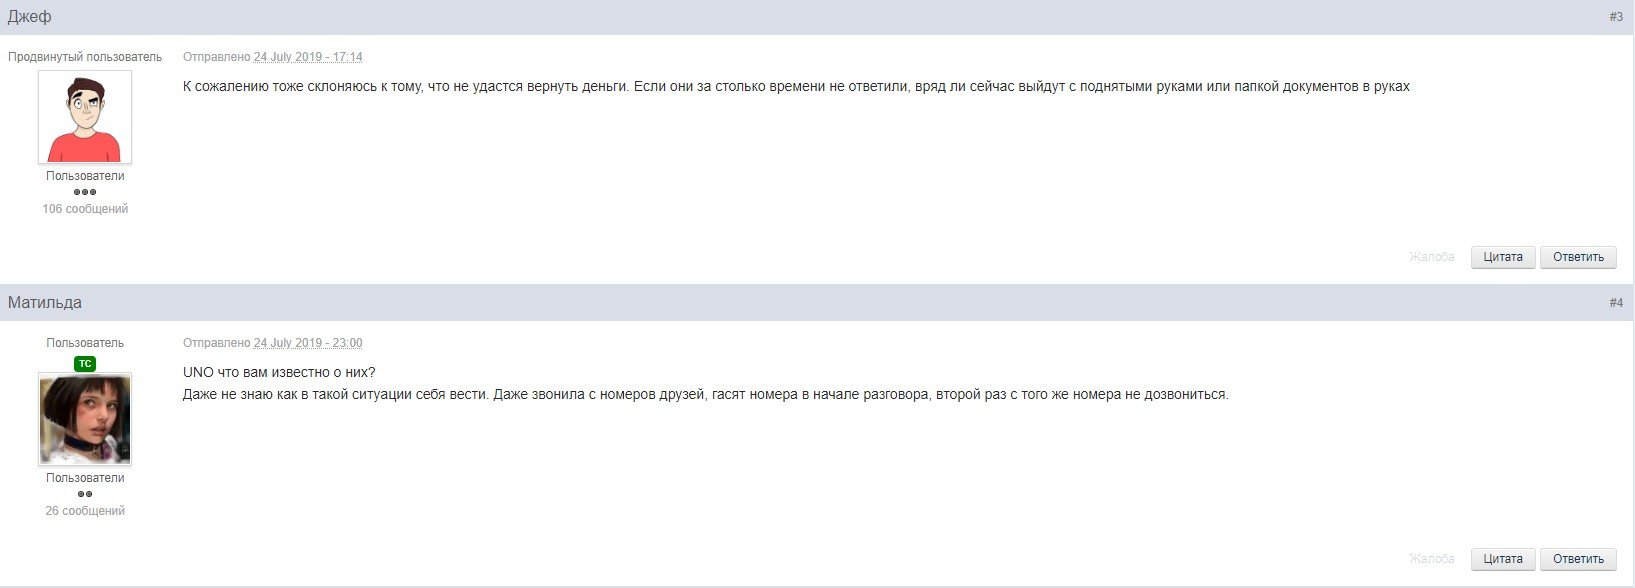 Отзыв о prokartapolaka на forum-eu.com